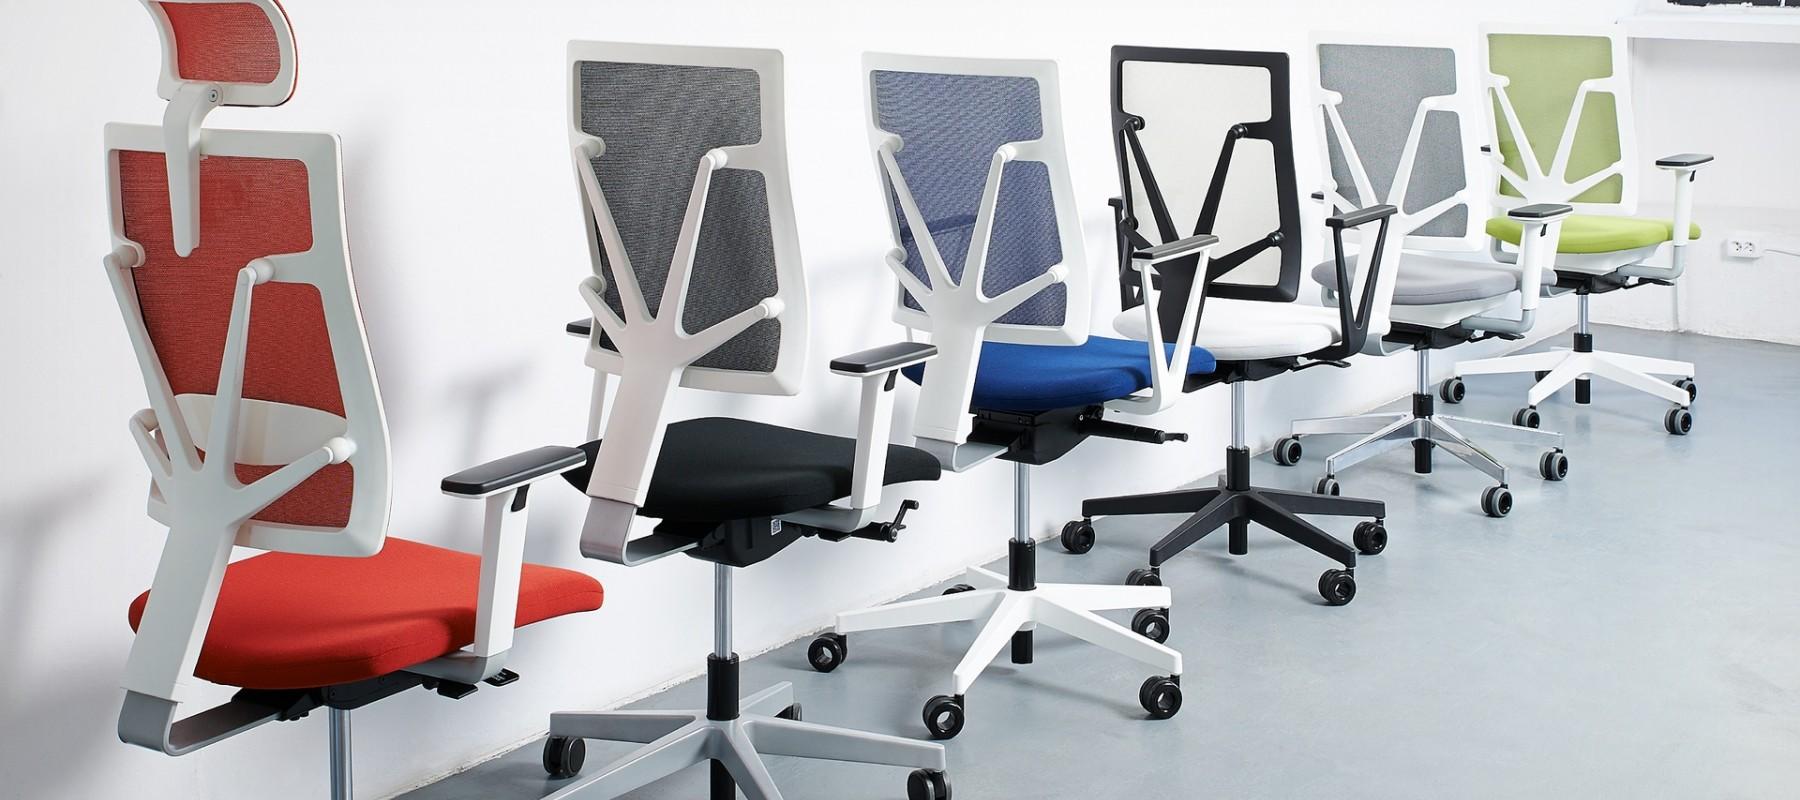 fotele-krzesla-siedziska-4me-2me-aranzacje11